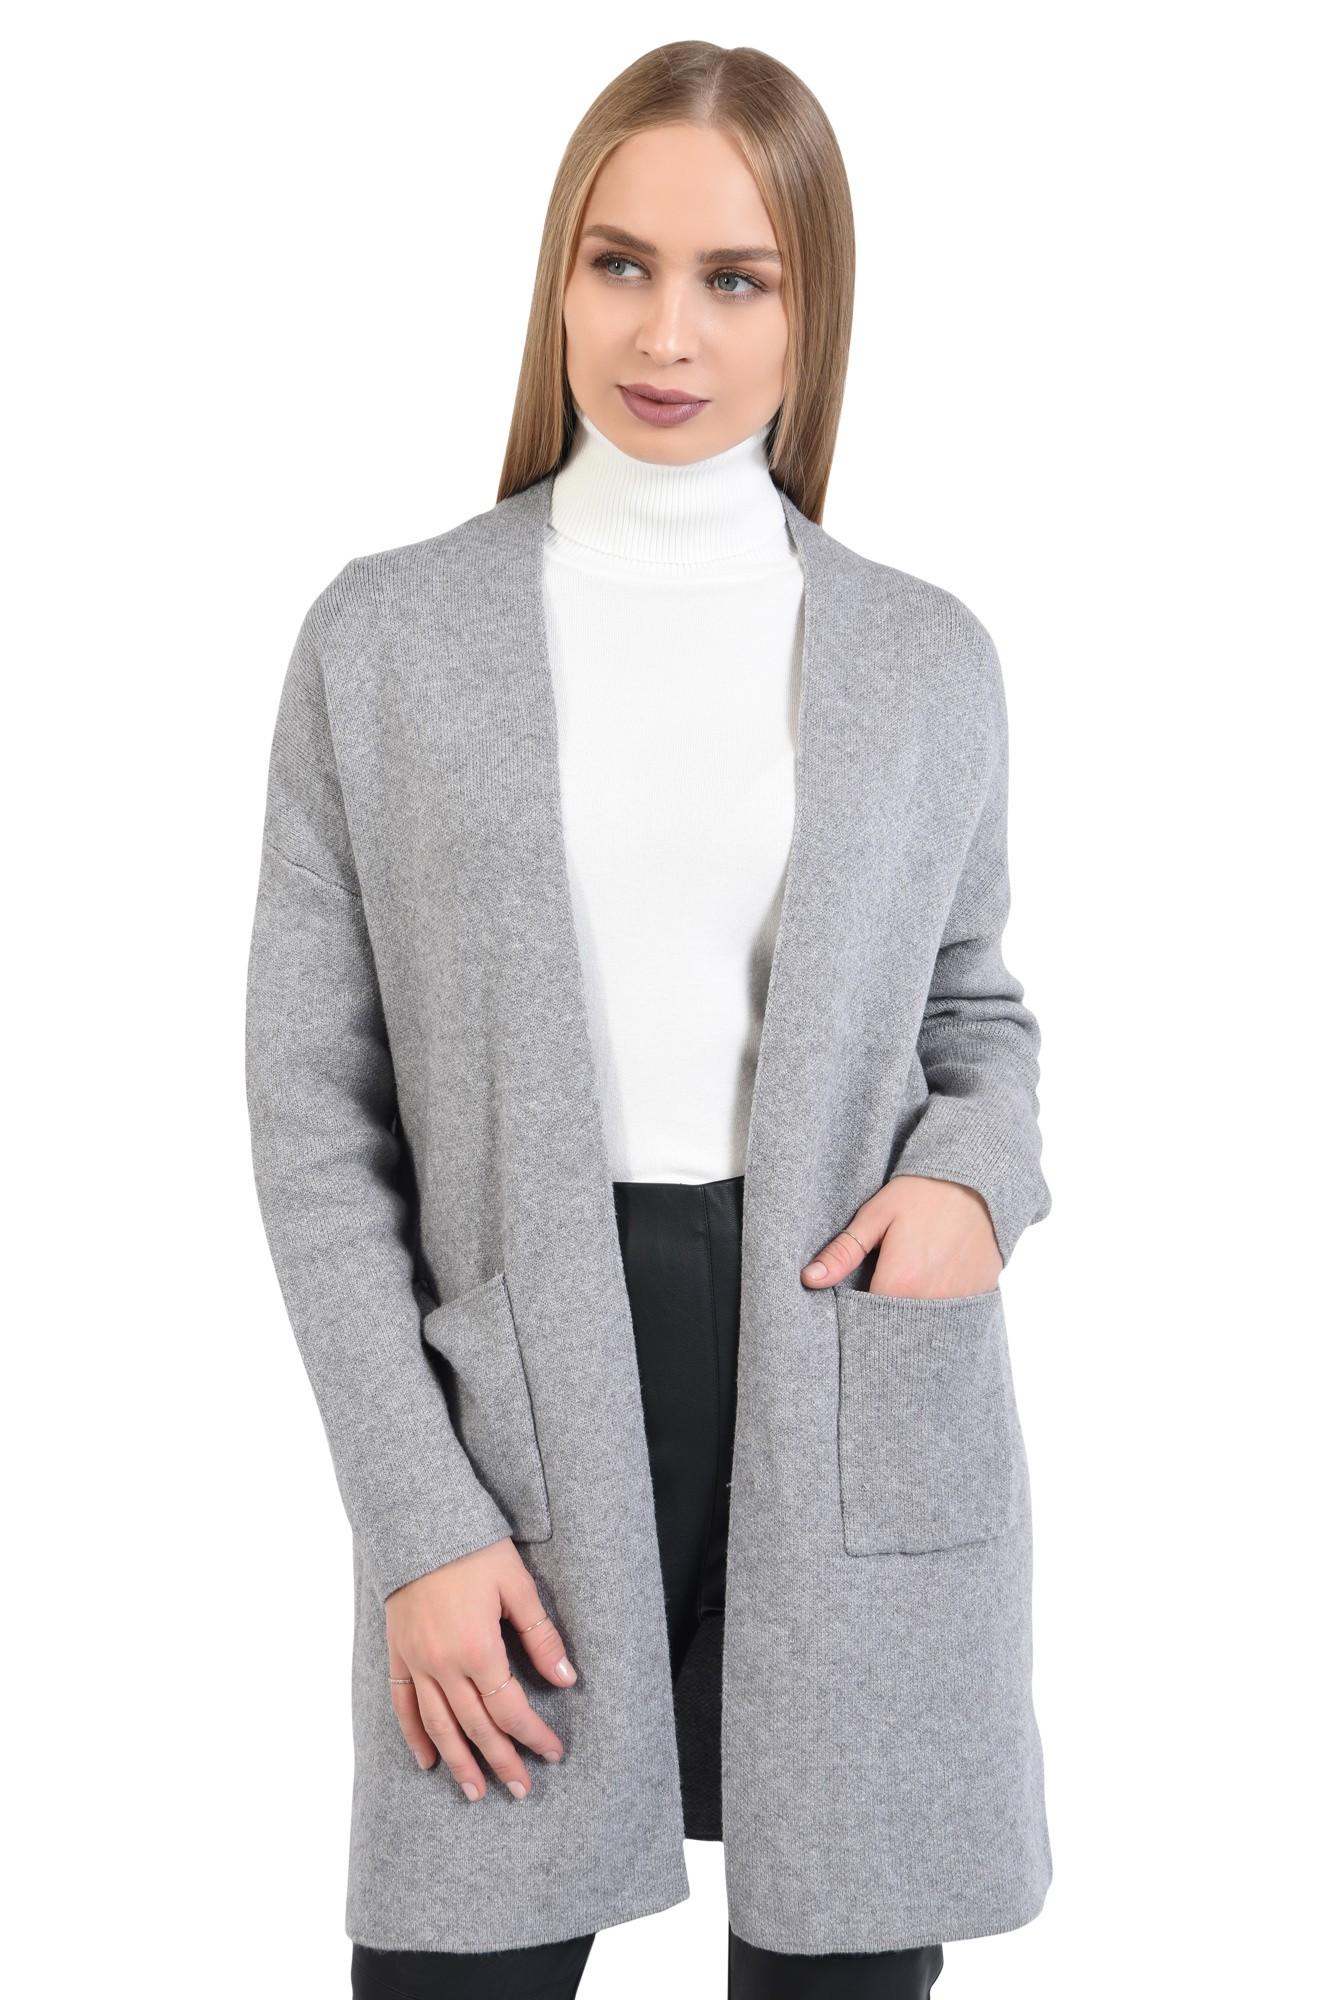 pulover gri, jacheta de toamna, croi drept lejer